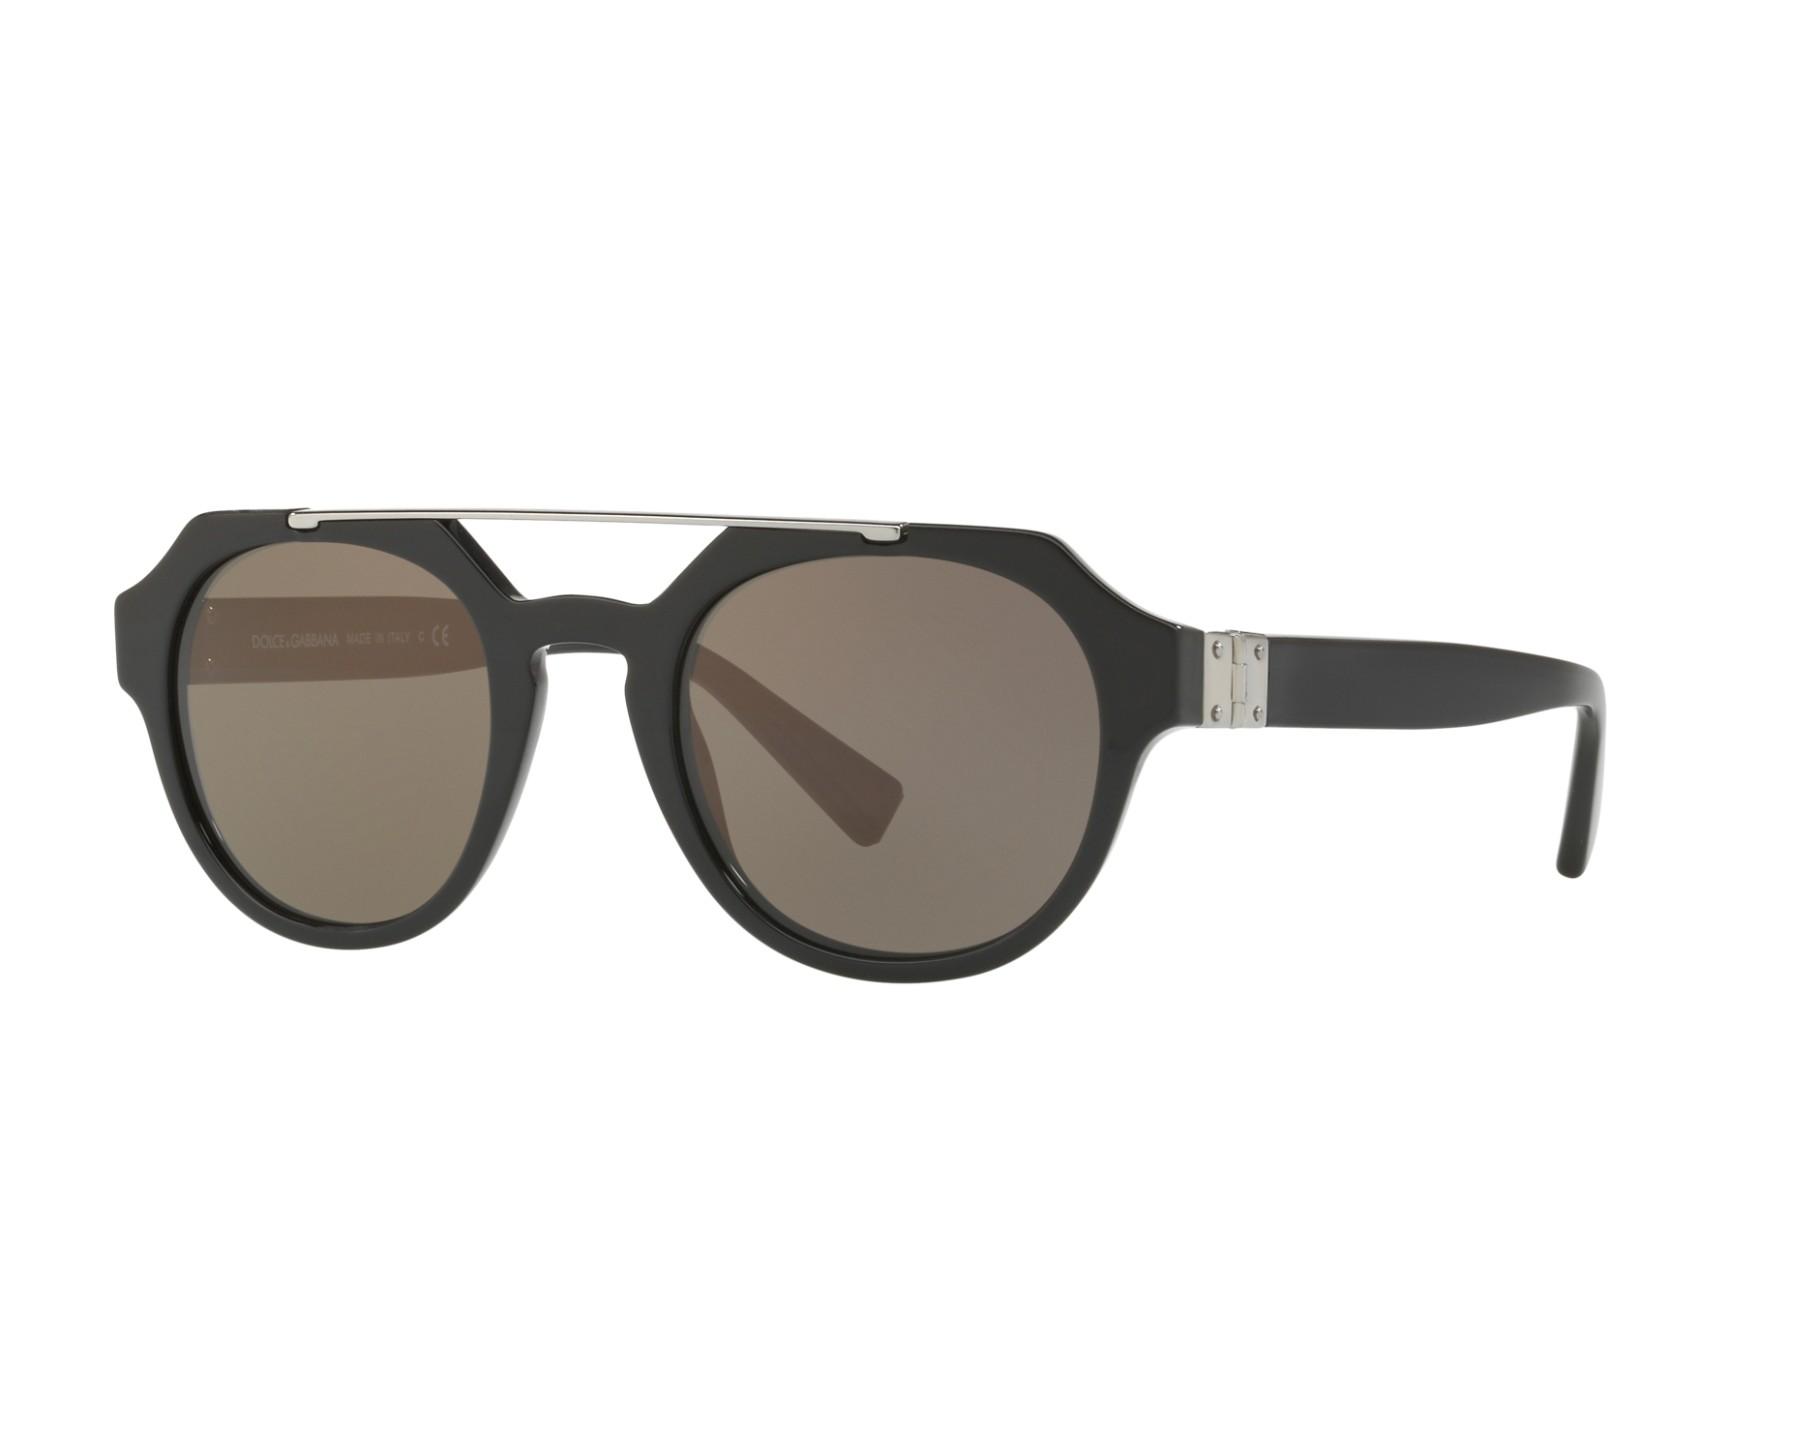 Dolce & Gabbana DG4313 3145R5 50-22 Yc506